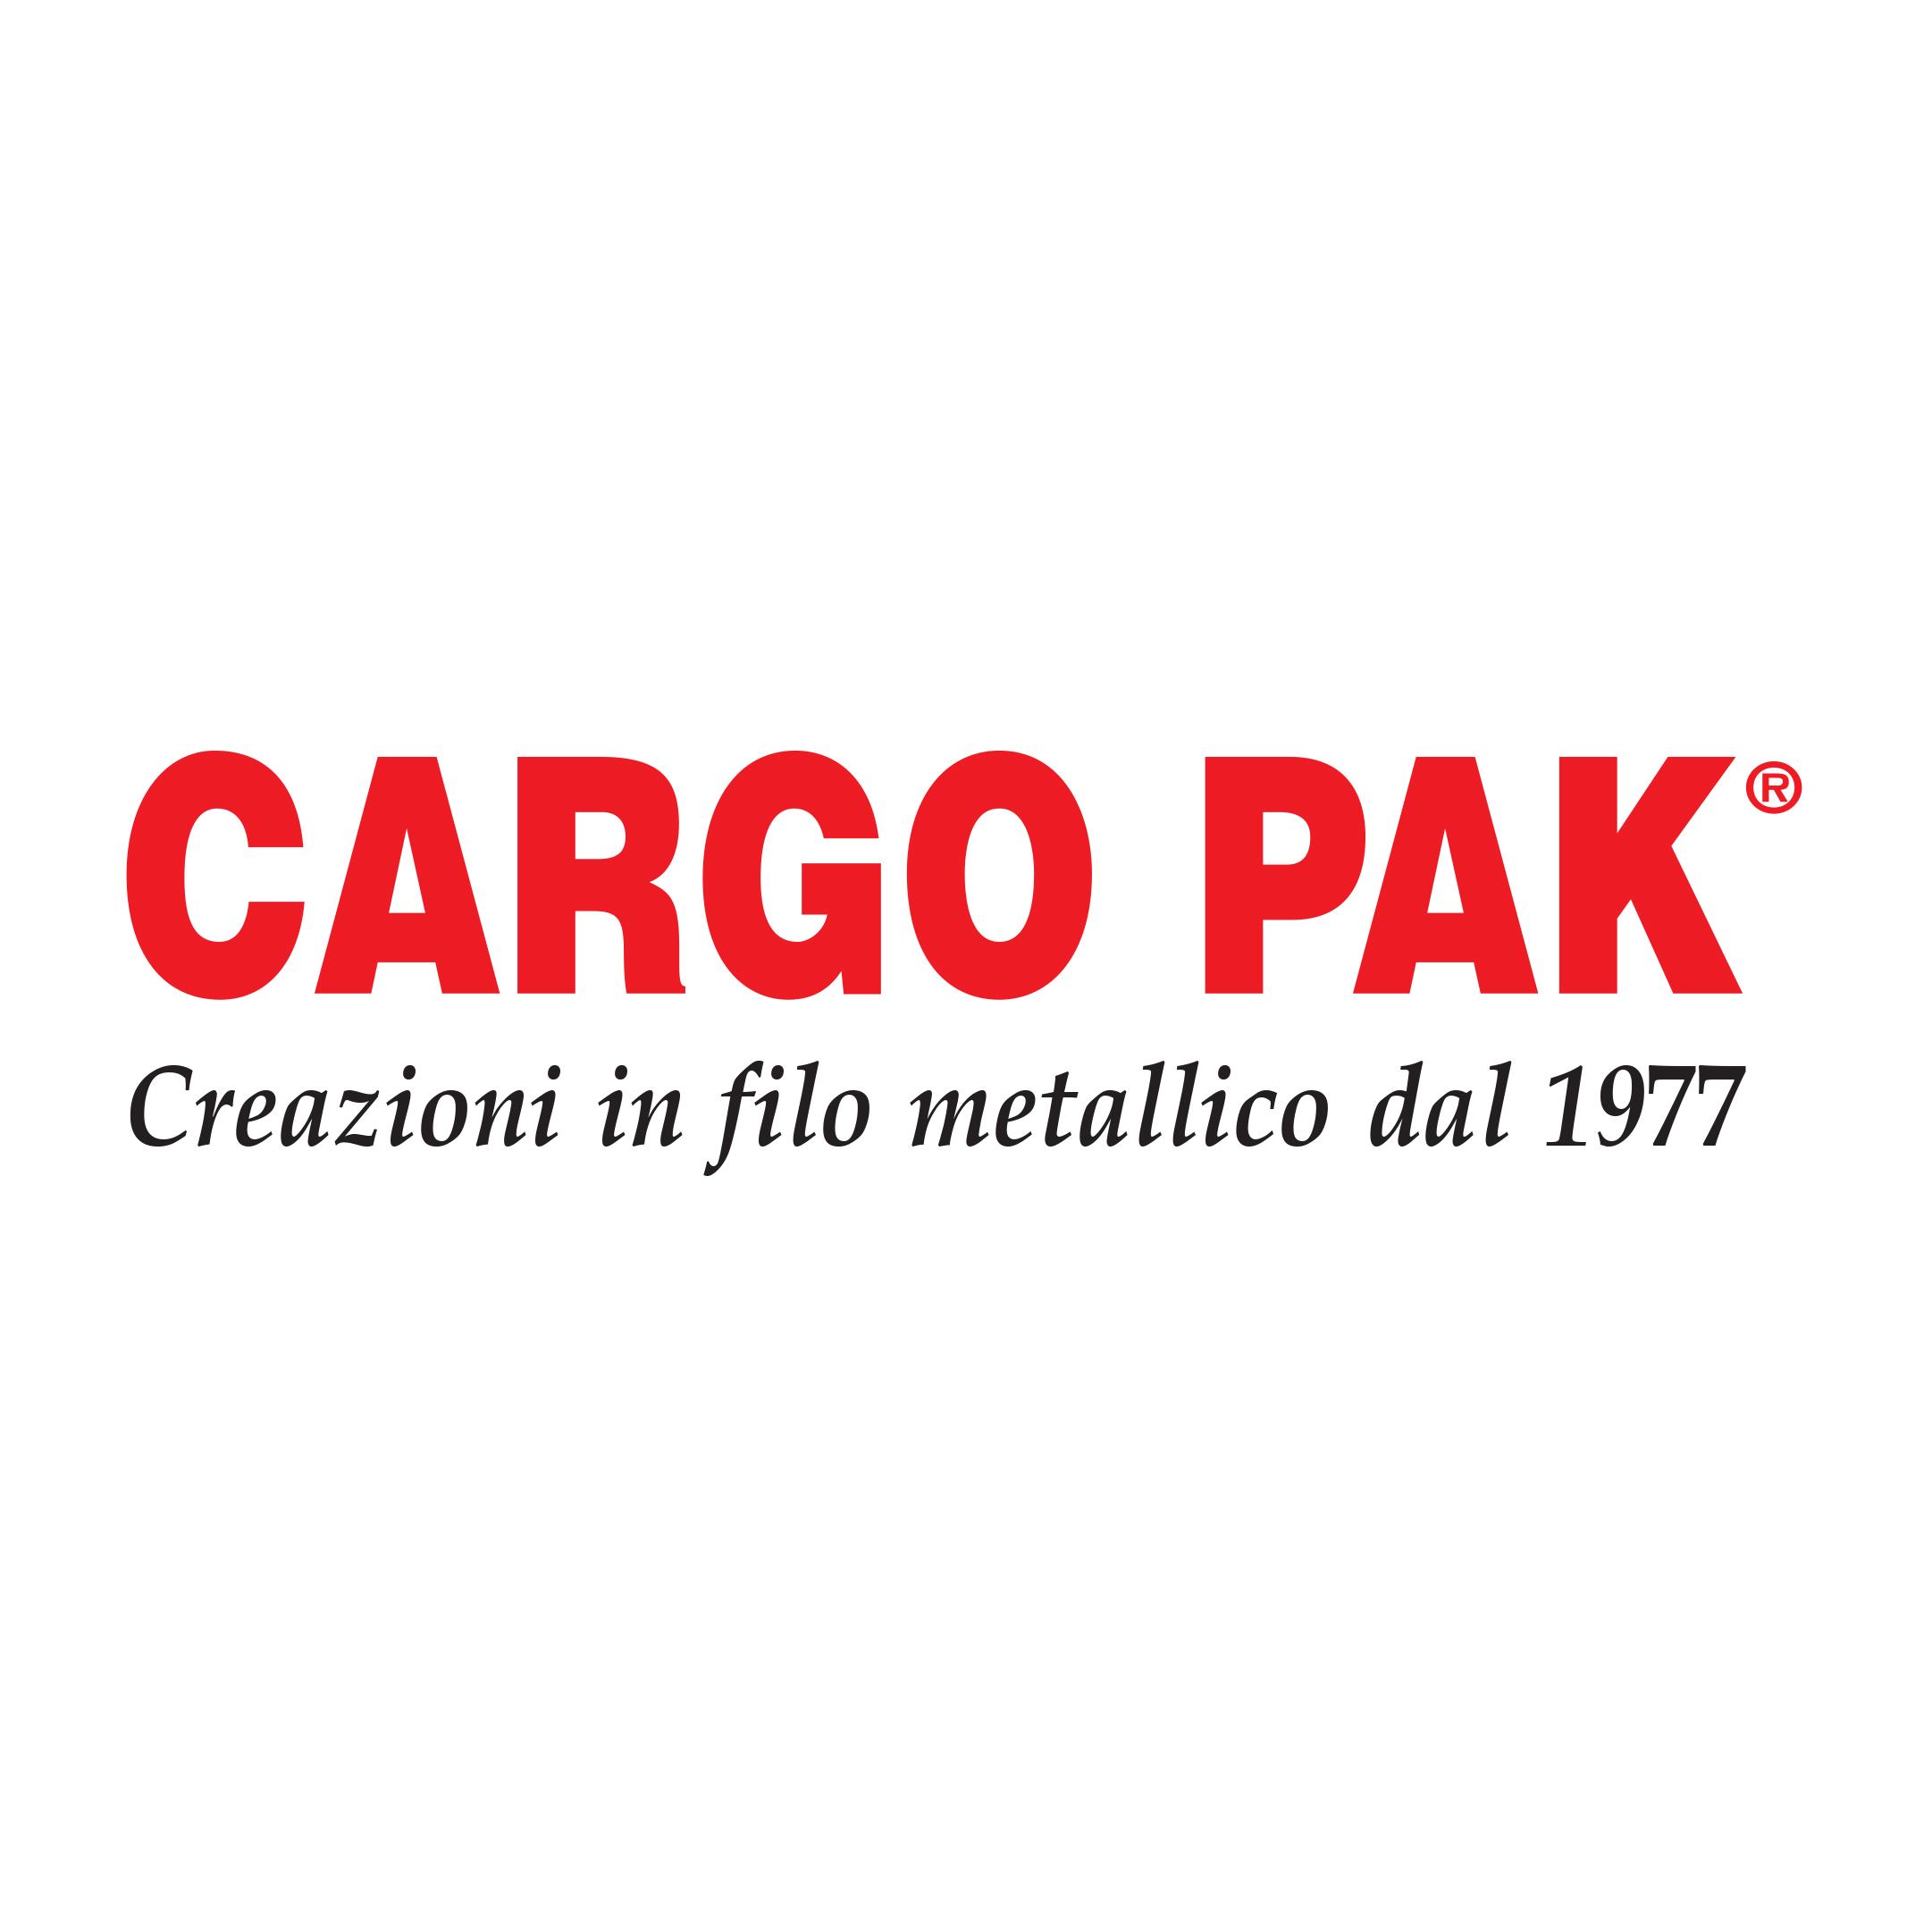 (c) Cargopak.fr